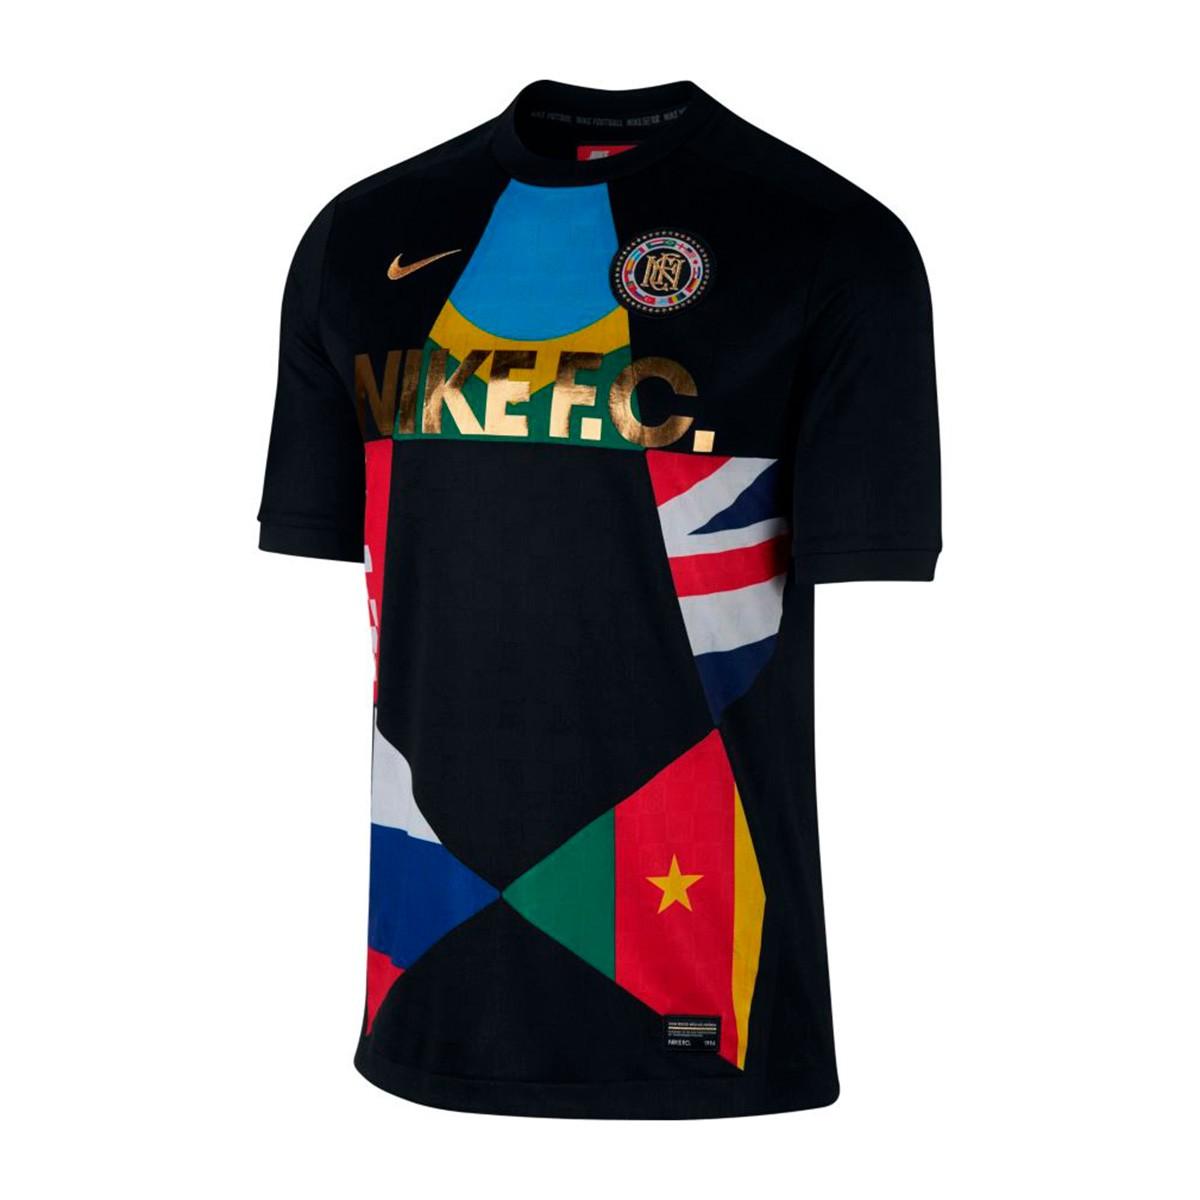 288dc64e7437 Jersey Nike Nike F.C. Black-University red - Tienda de fútbol Fútbol ...